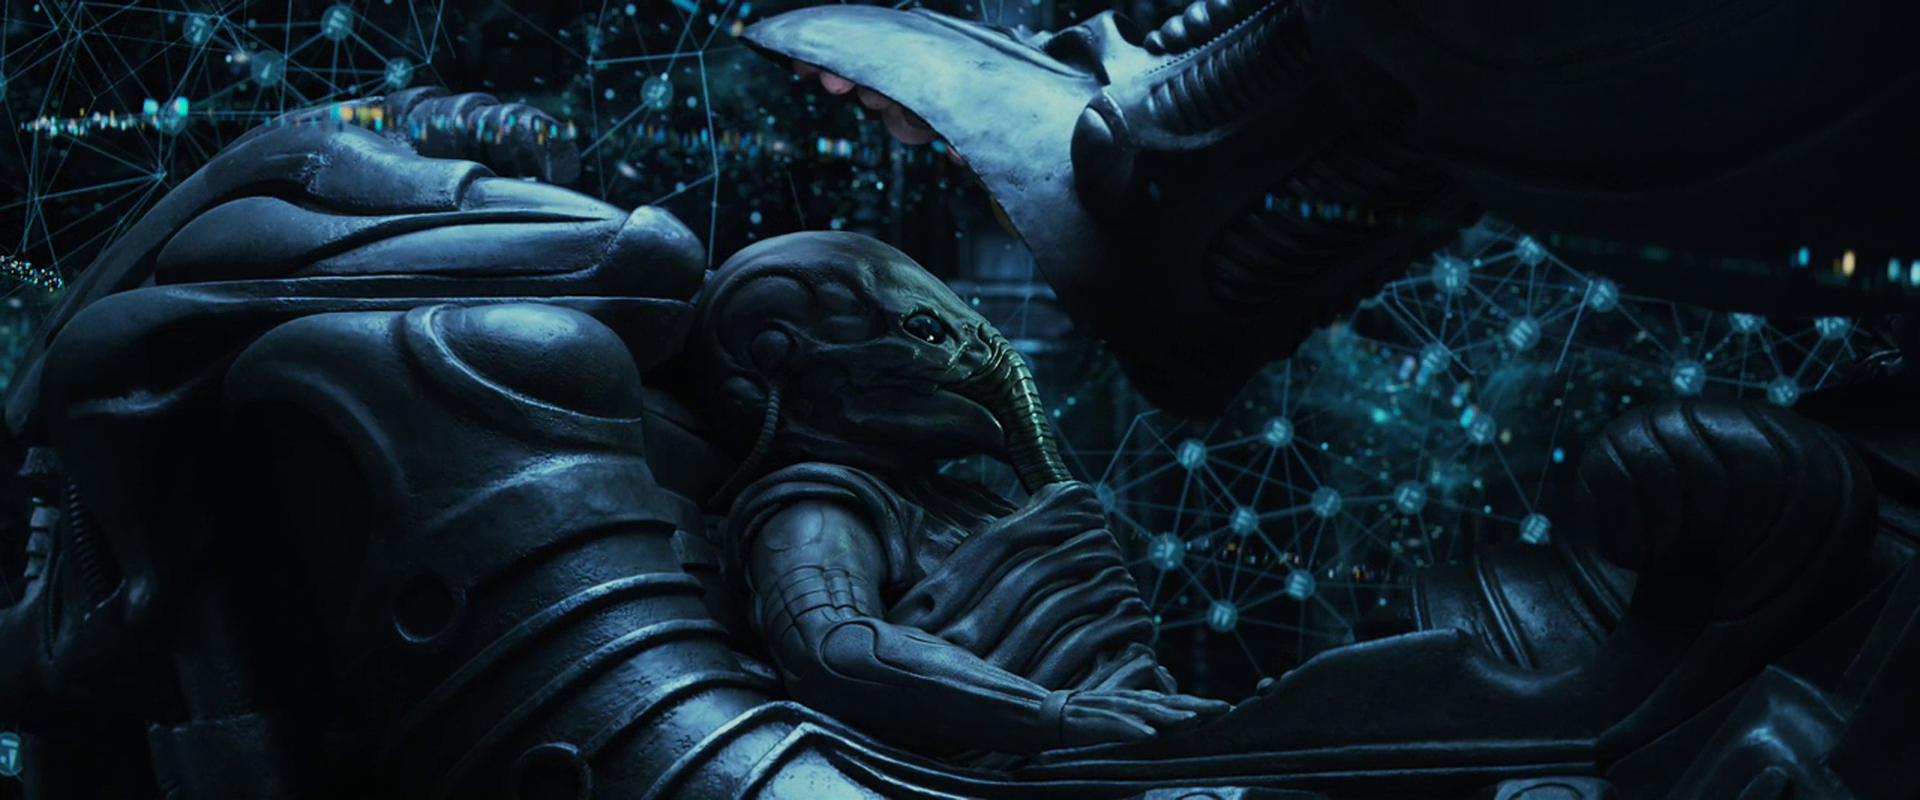 Image Space Jockey Png Xenopedia The Alien Vs